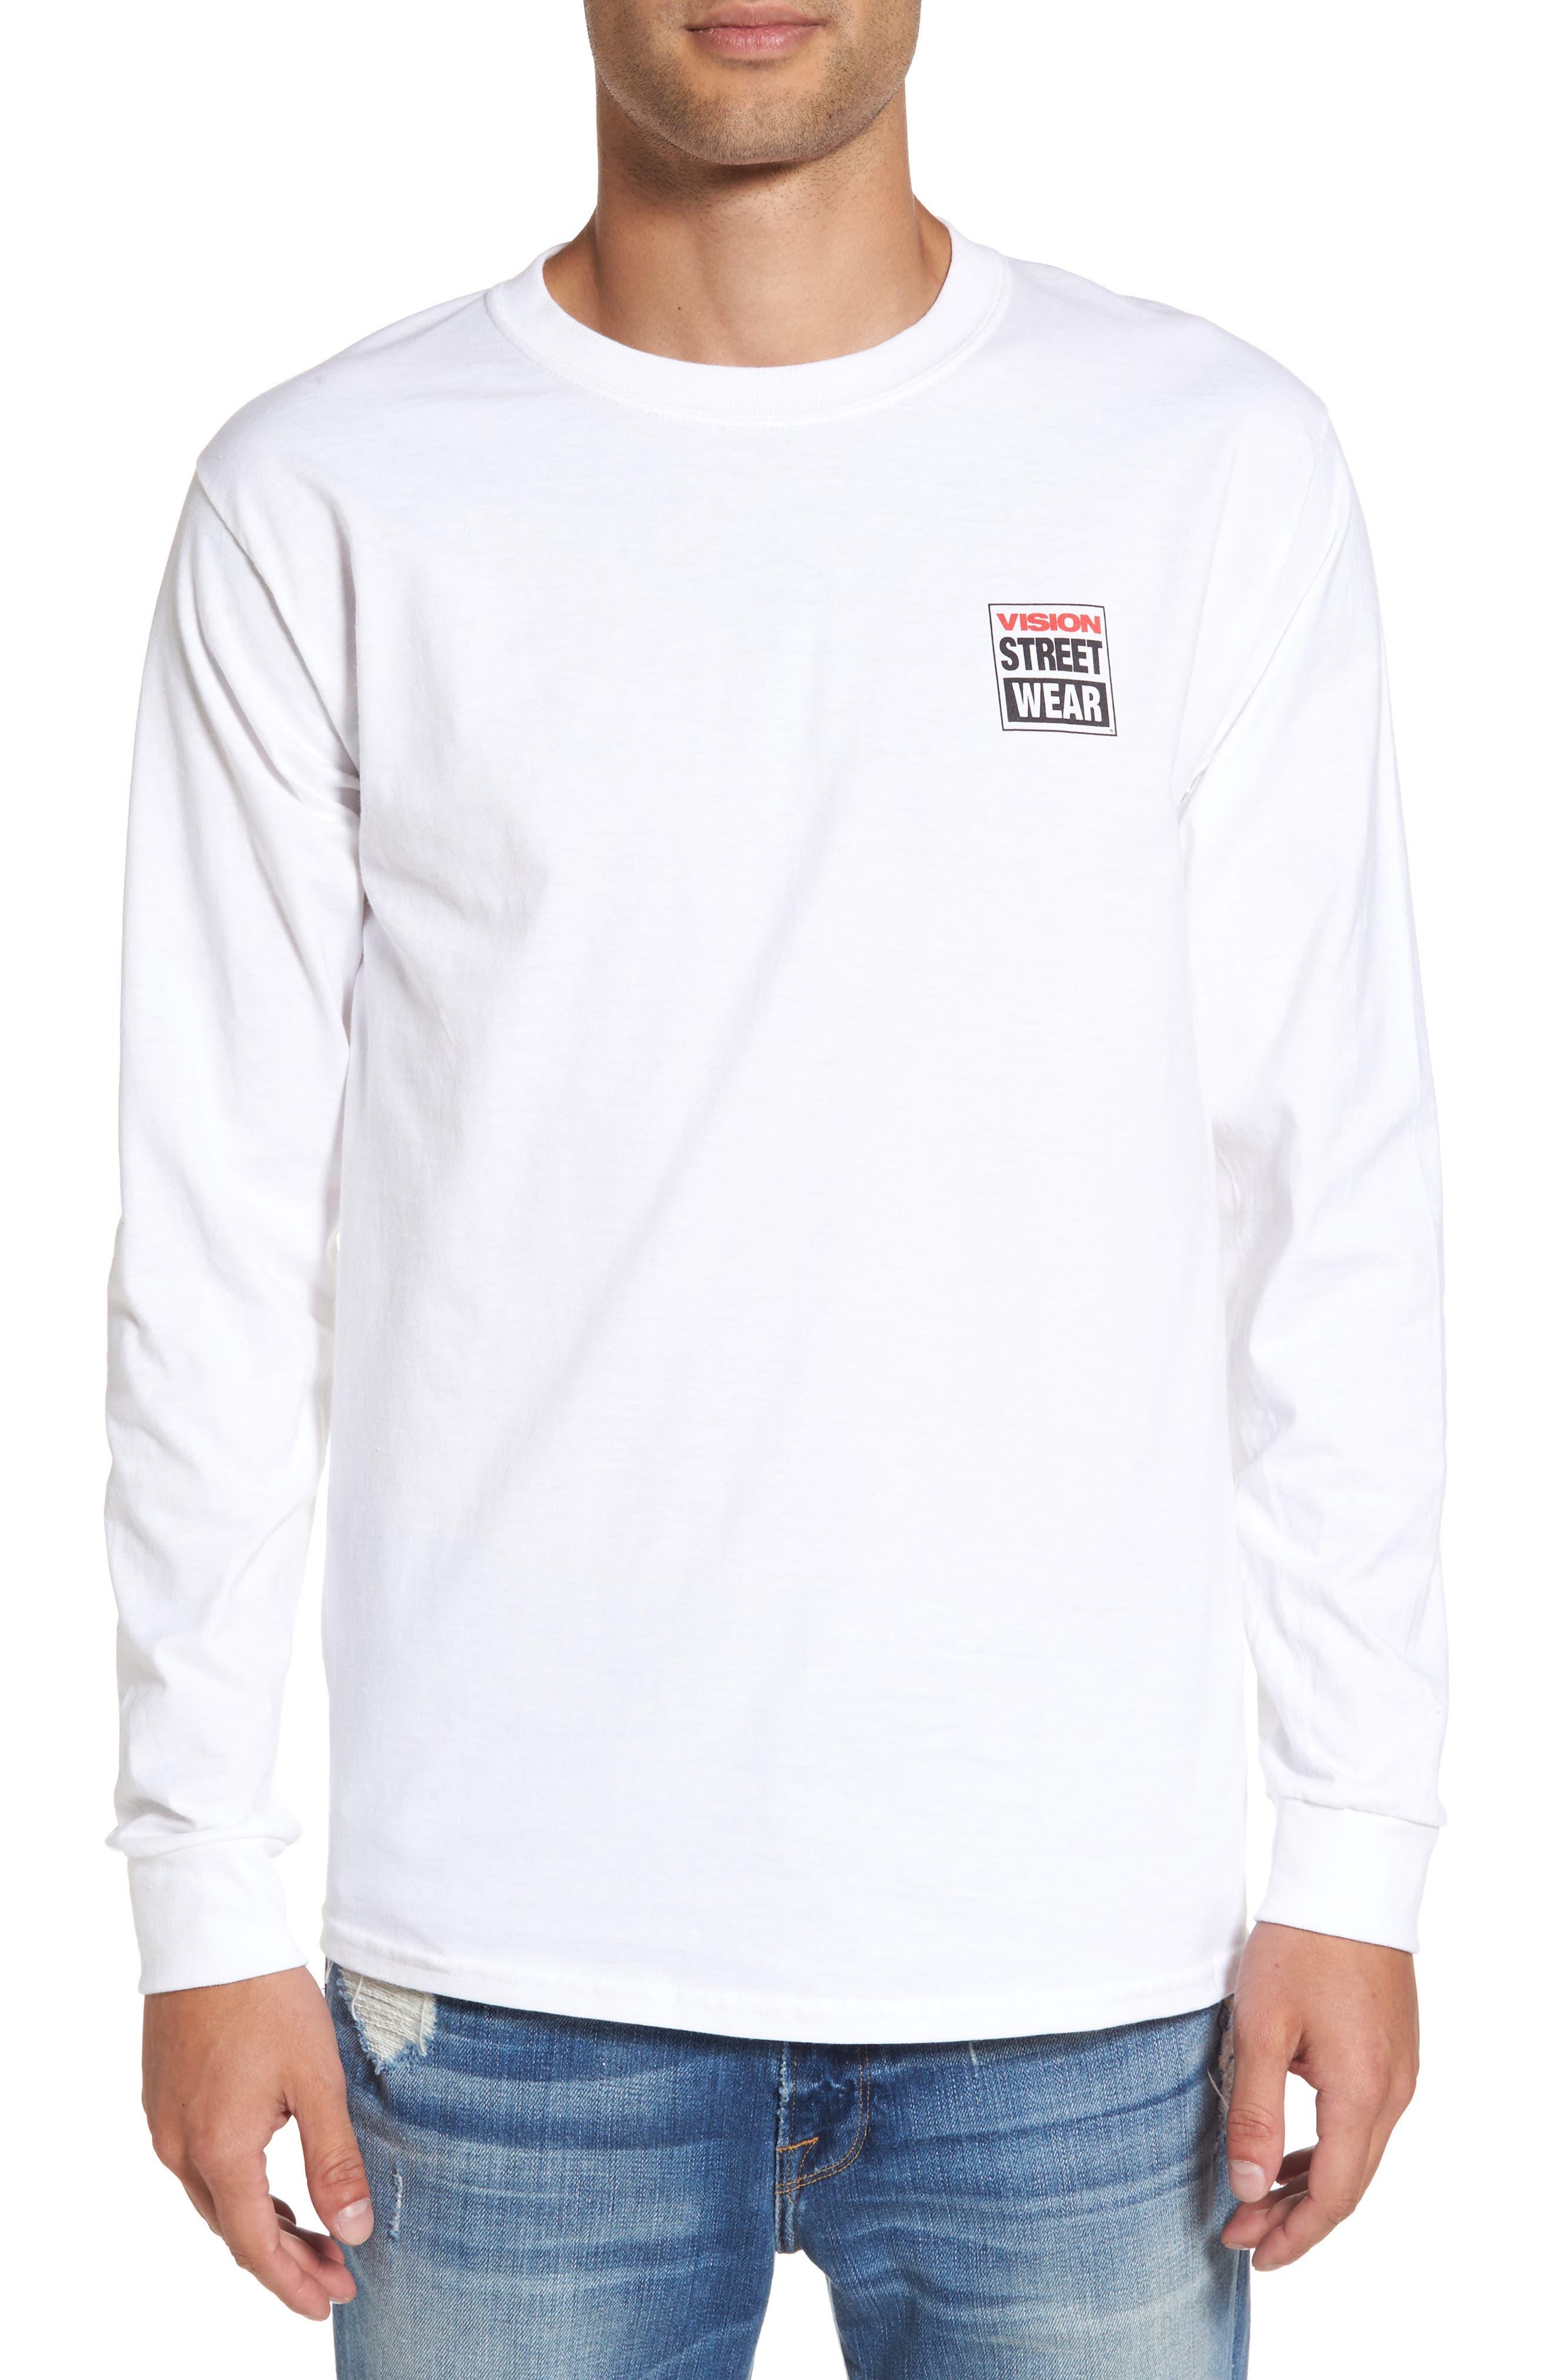 Vision Street Wear Long Sleeve T-Shirt,                             Alternate thumbnail 2, color,                             100